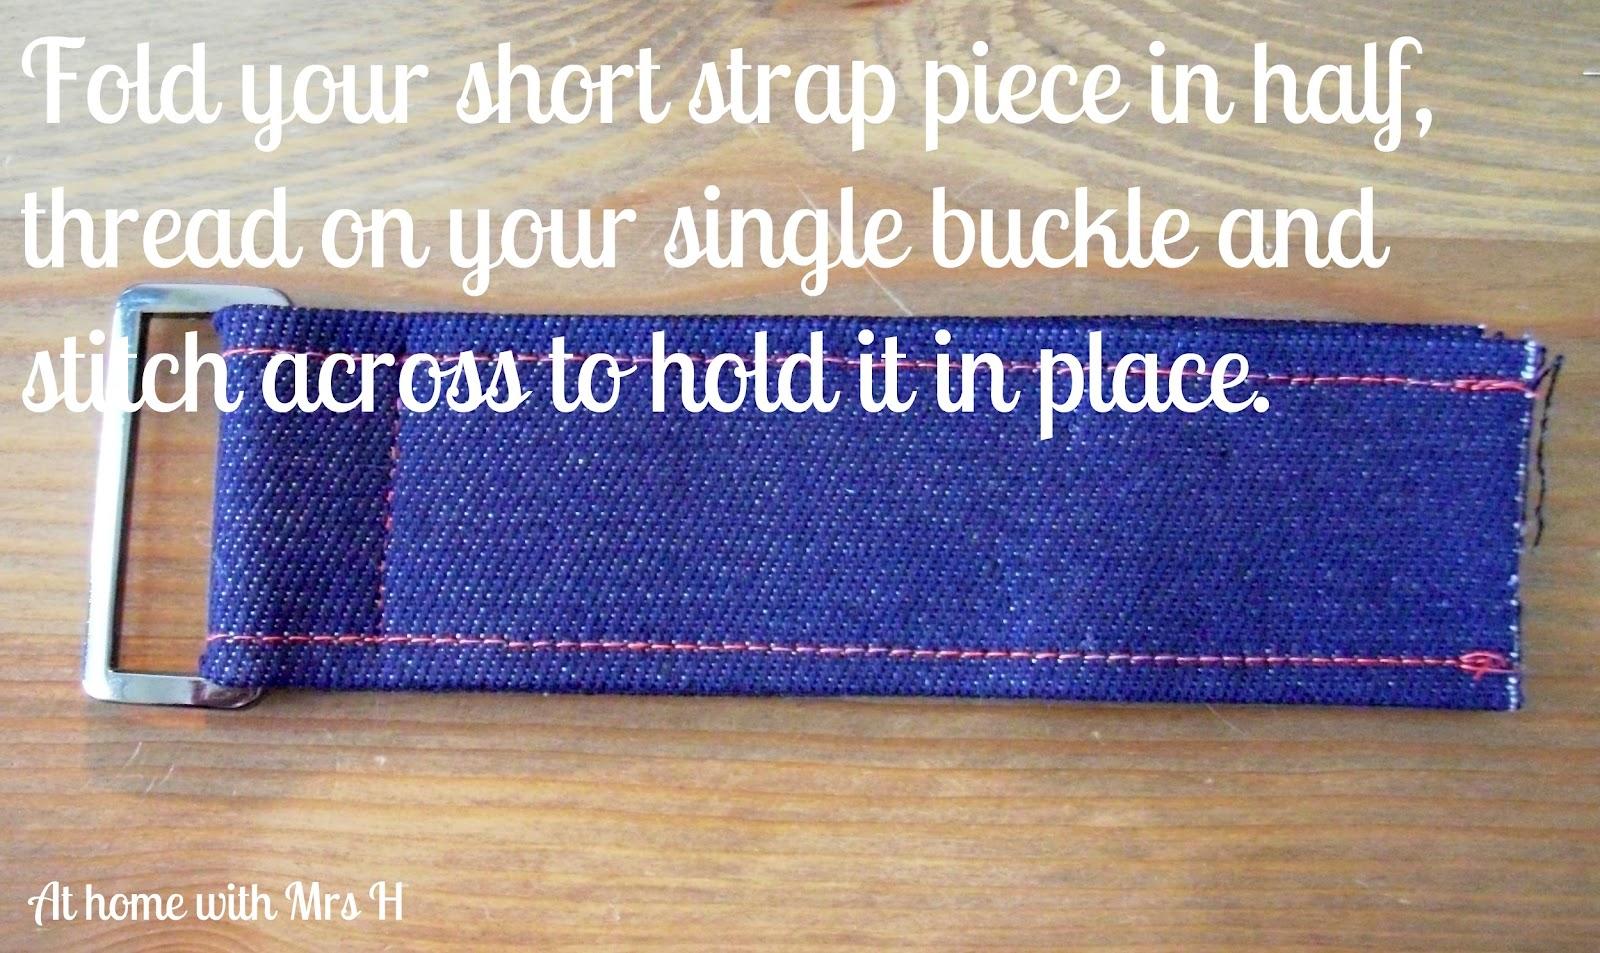 how to make straps adjustable